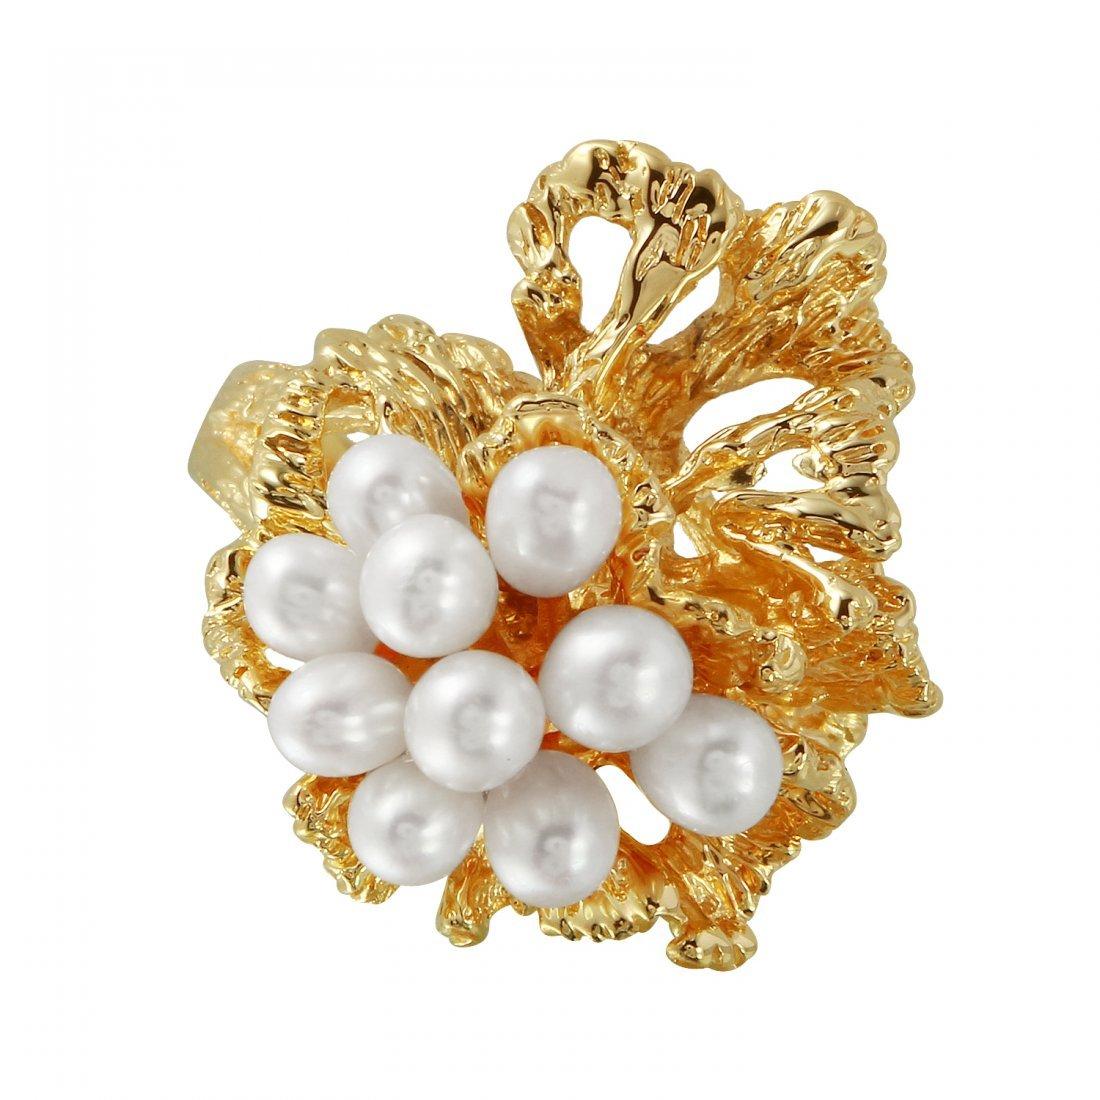 Ladies 3-4MM Freshwater Pearl 14K Yellow Gold Ring - 3